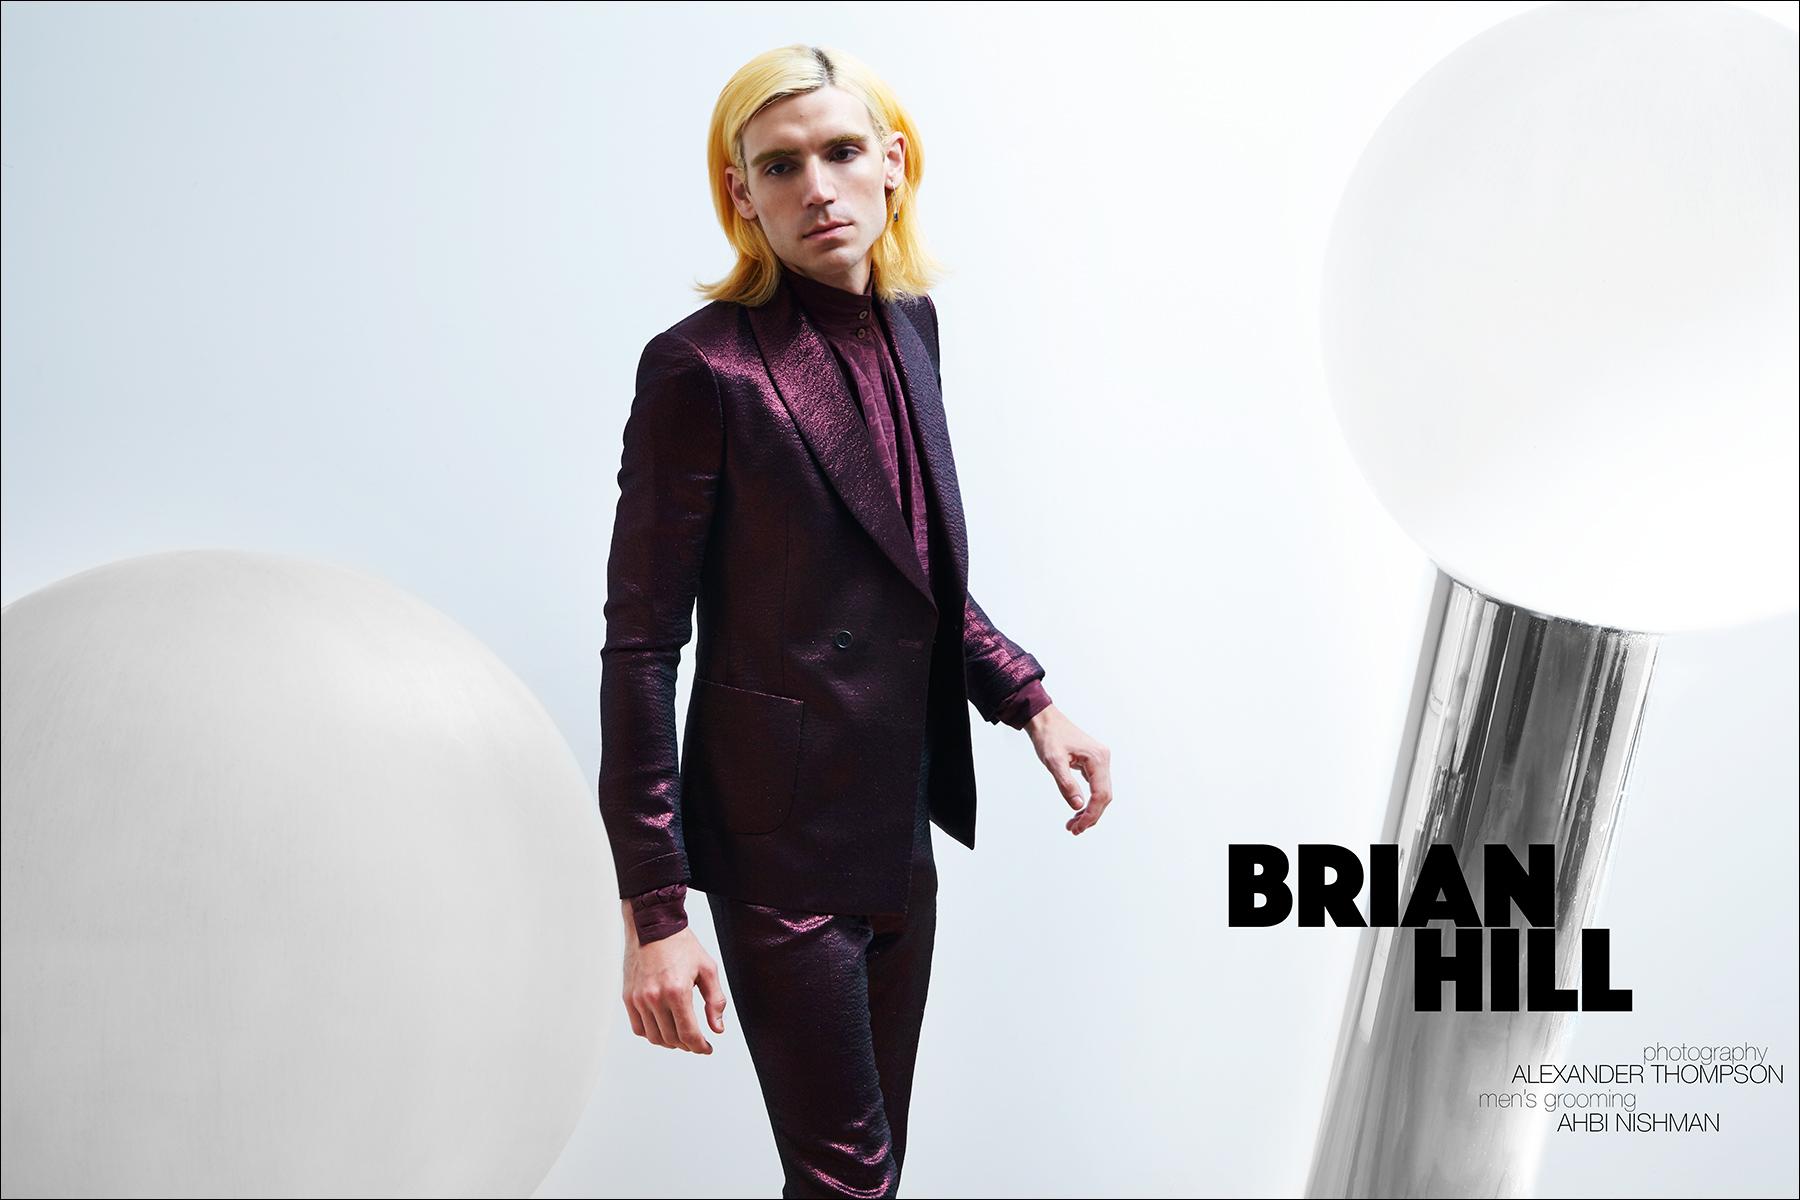 BRIAN-HILL-OPENER.jpg